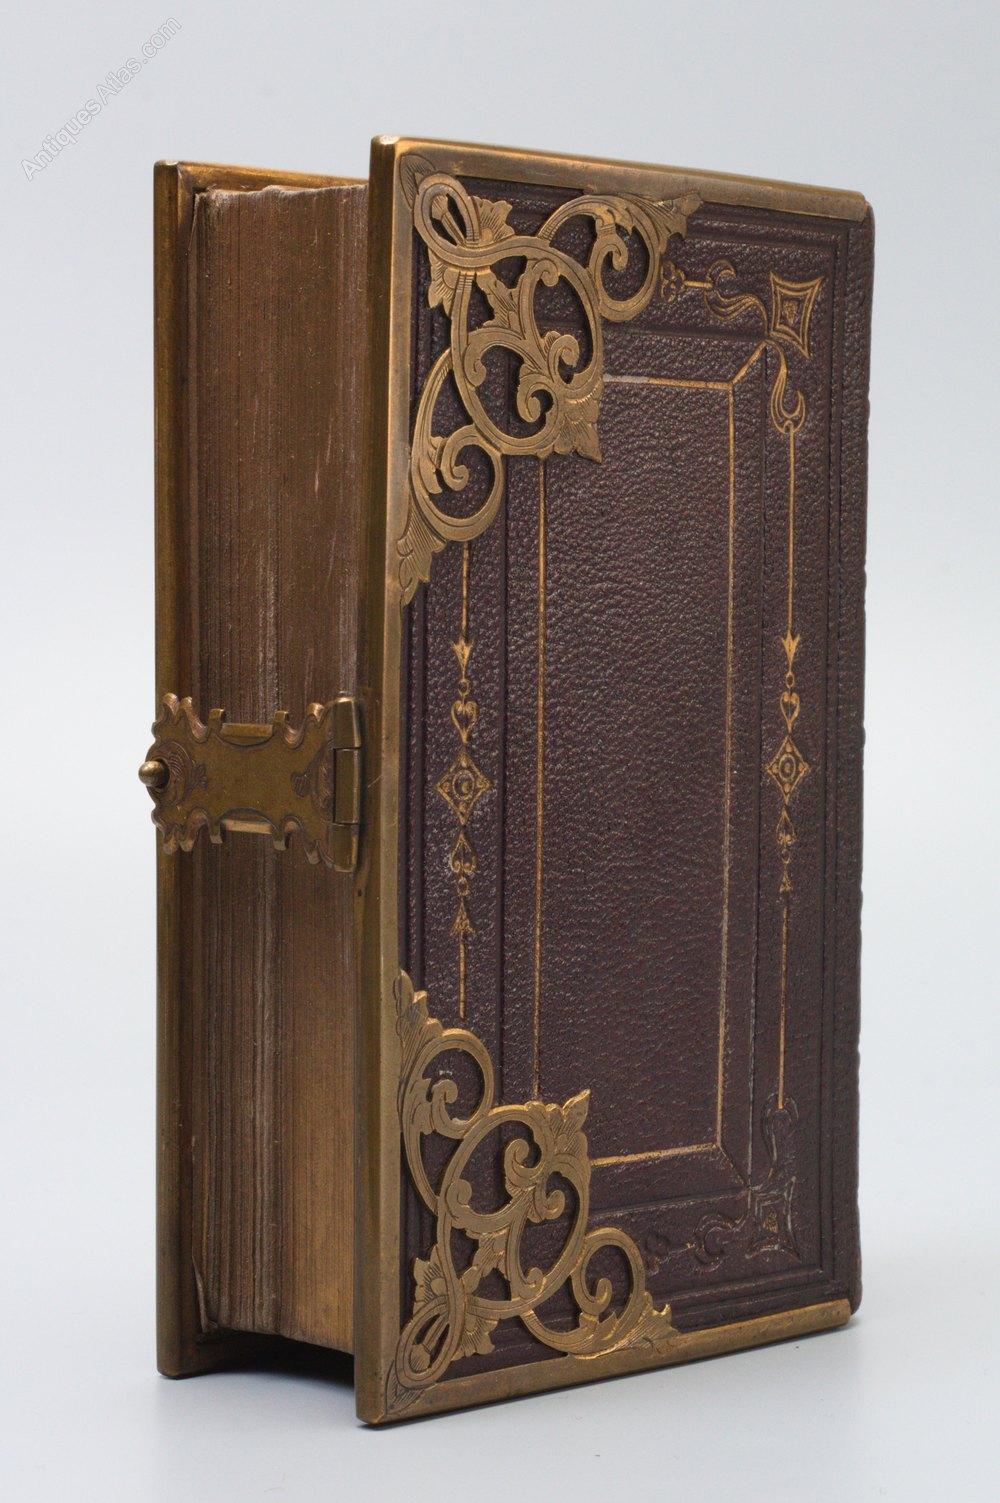 1850 Church Services - Oxford University Press